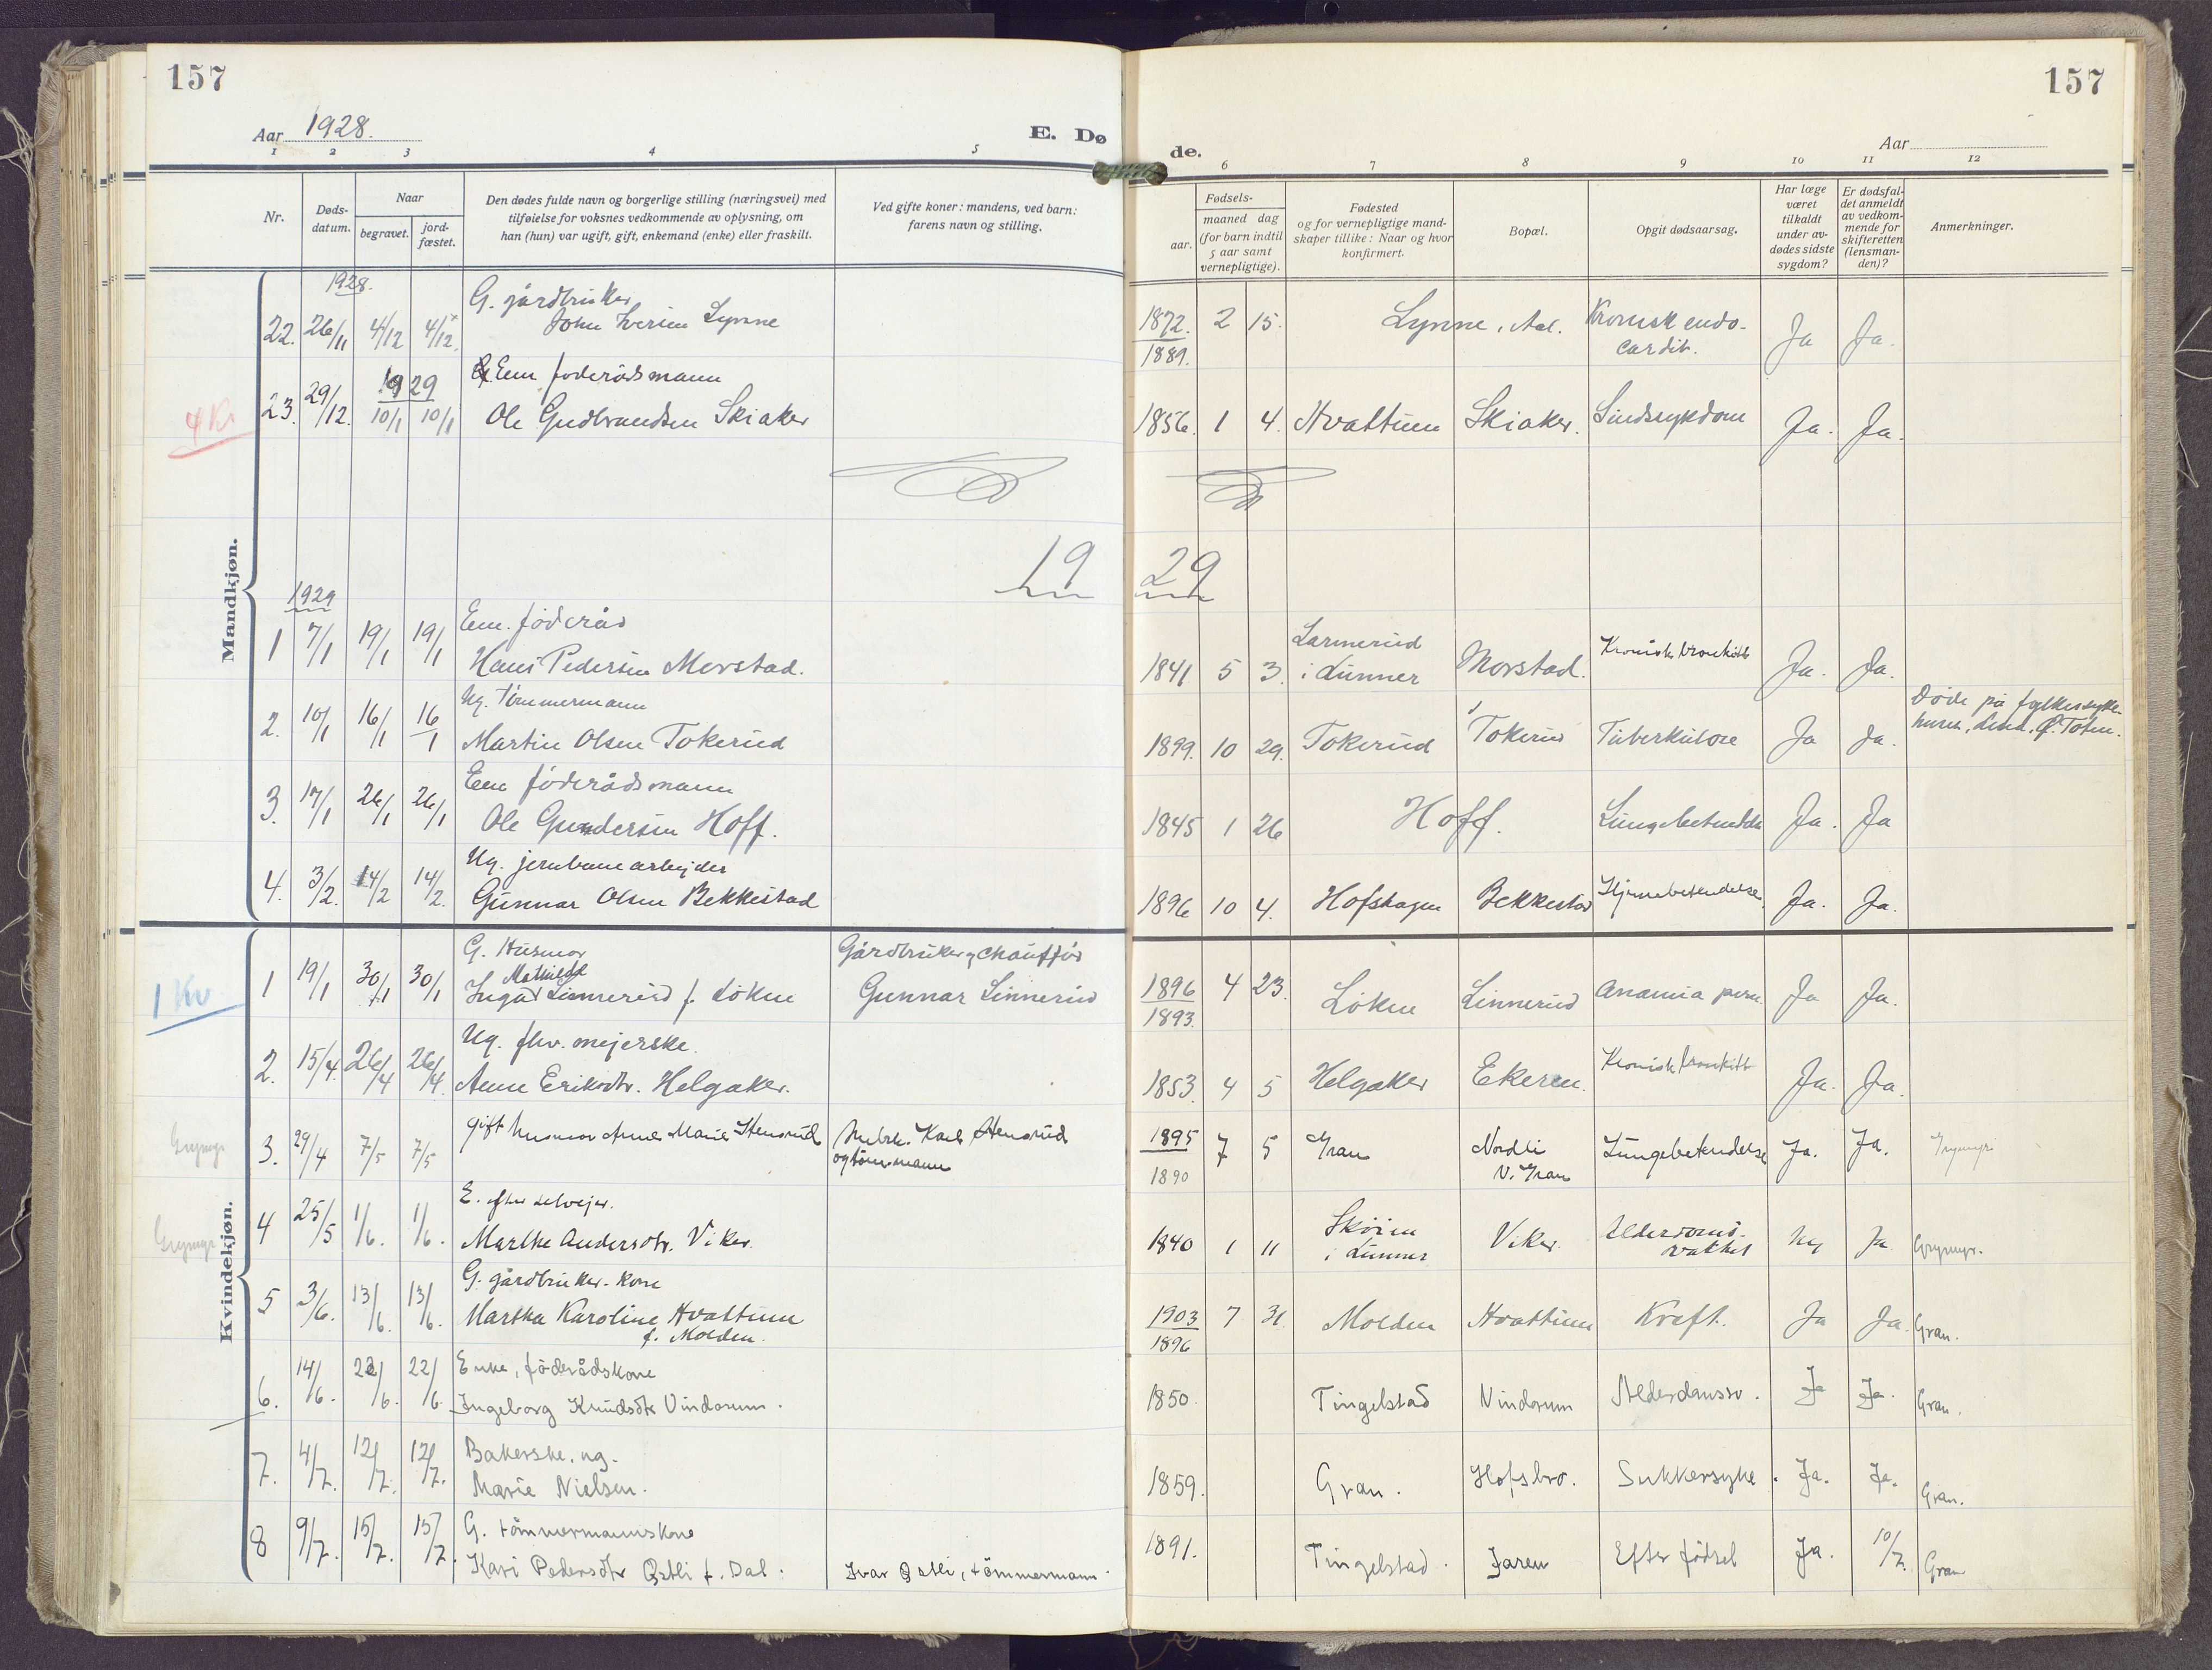 SAH, Gran prestekontor, Ministerialbok nr. 23, 1919-1938, s. 157